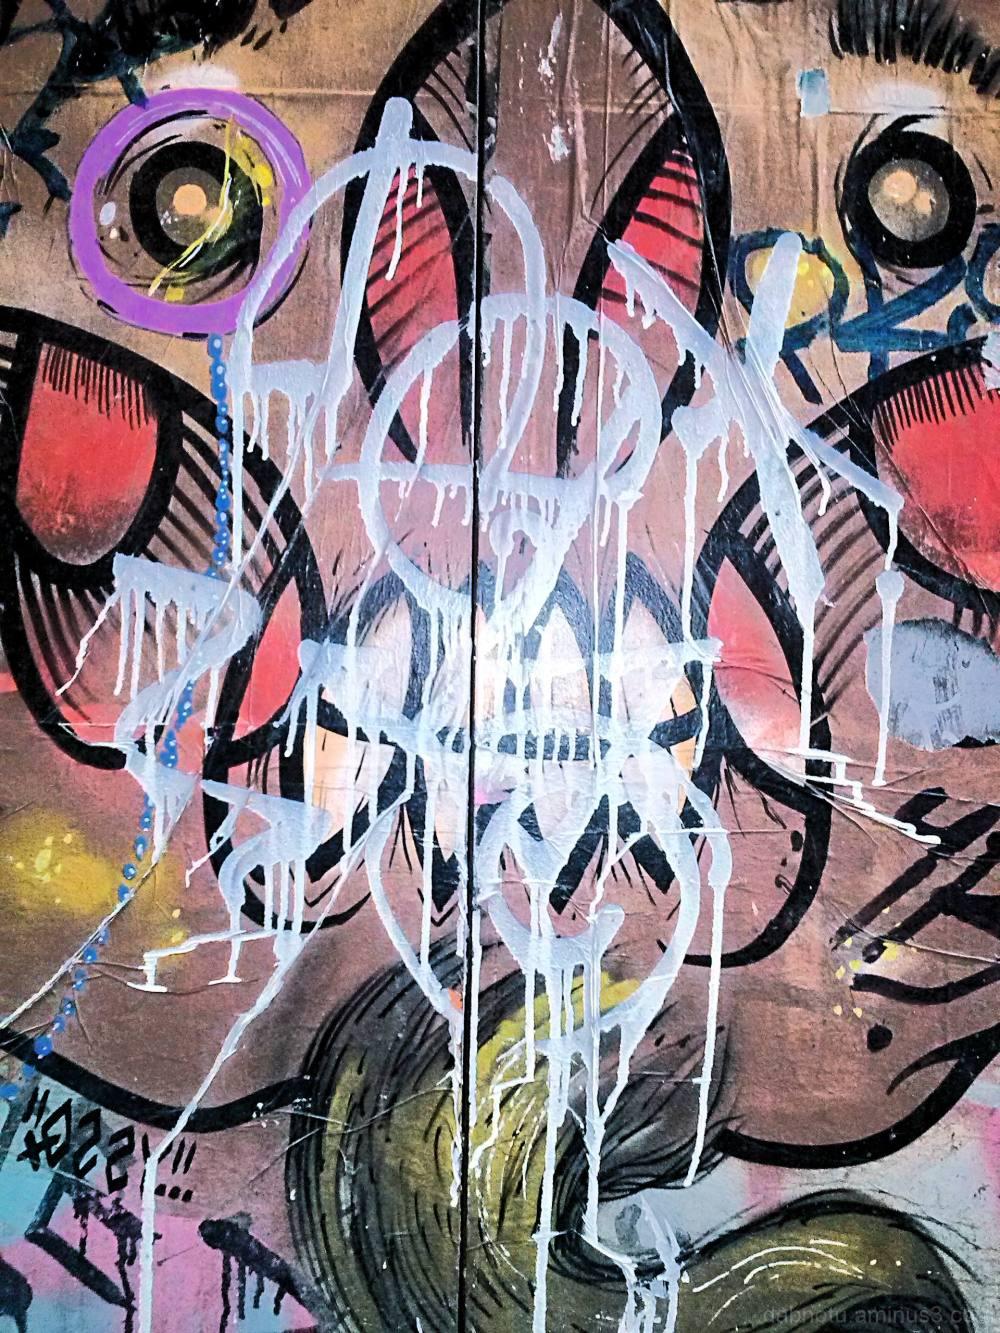 Barcelona urban exploration graffiti, smartphone.